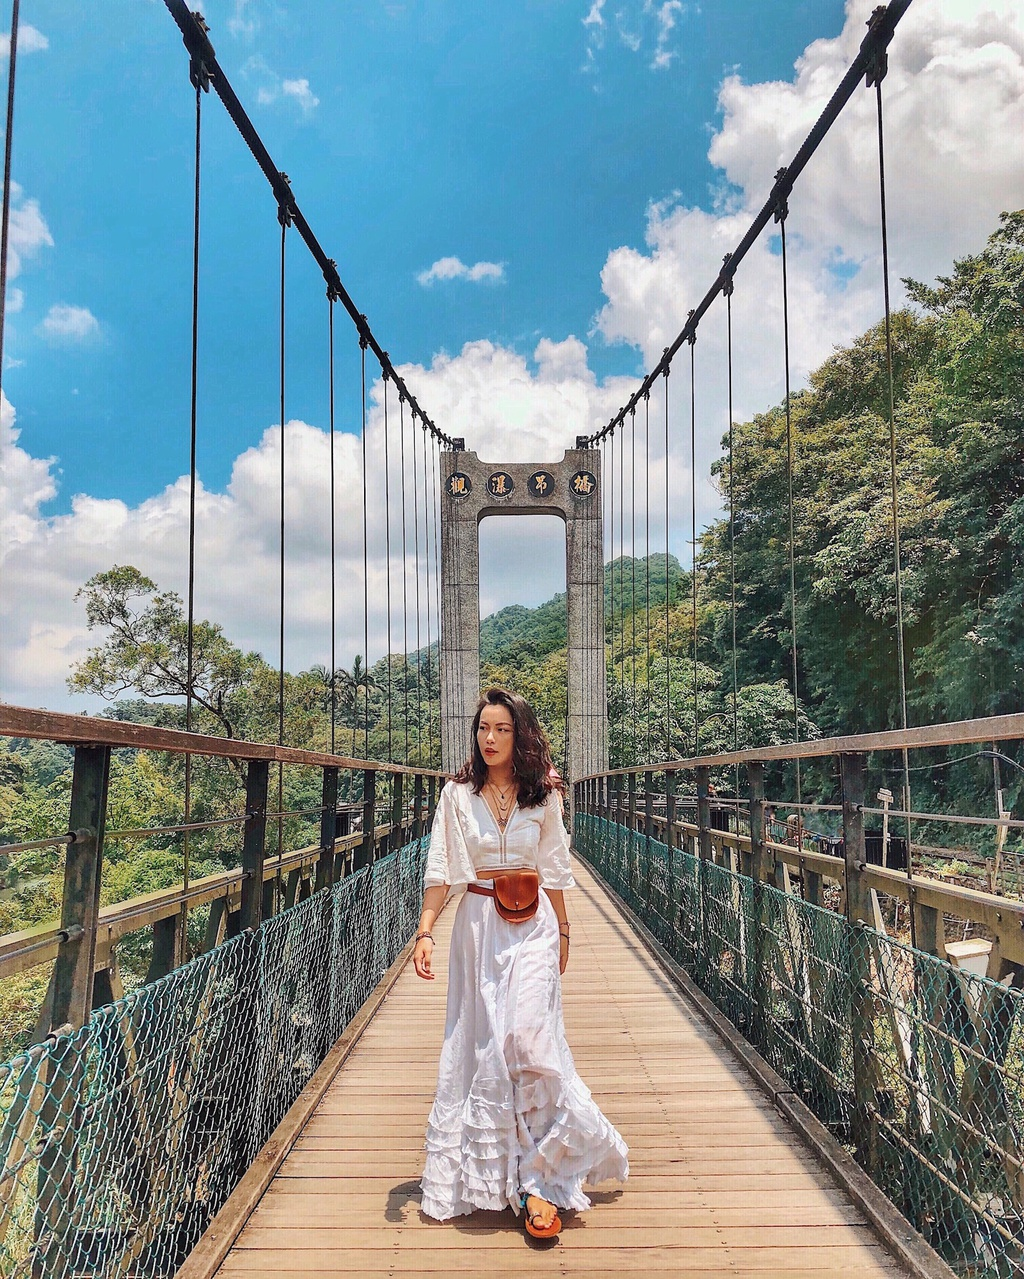 #Mytour: Lac theo Ha Truc kham pha thien nhien mong mo Tan Bac hinh anh 14